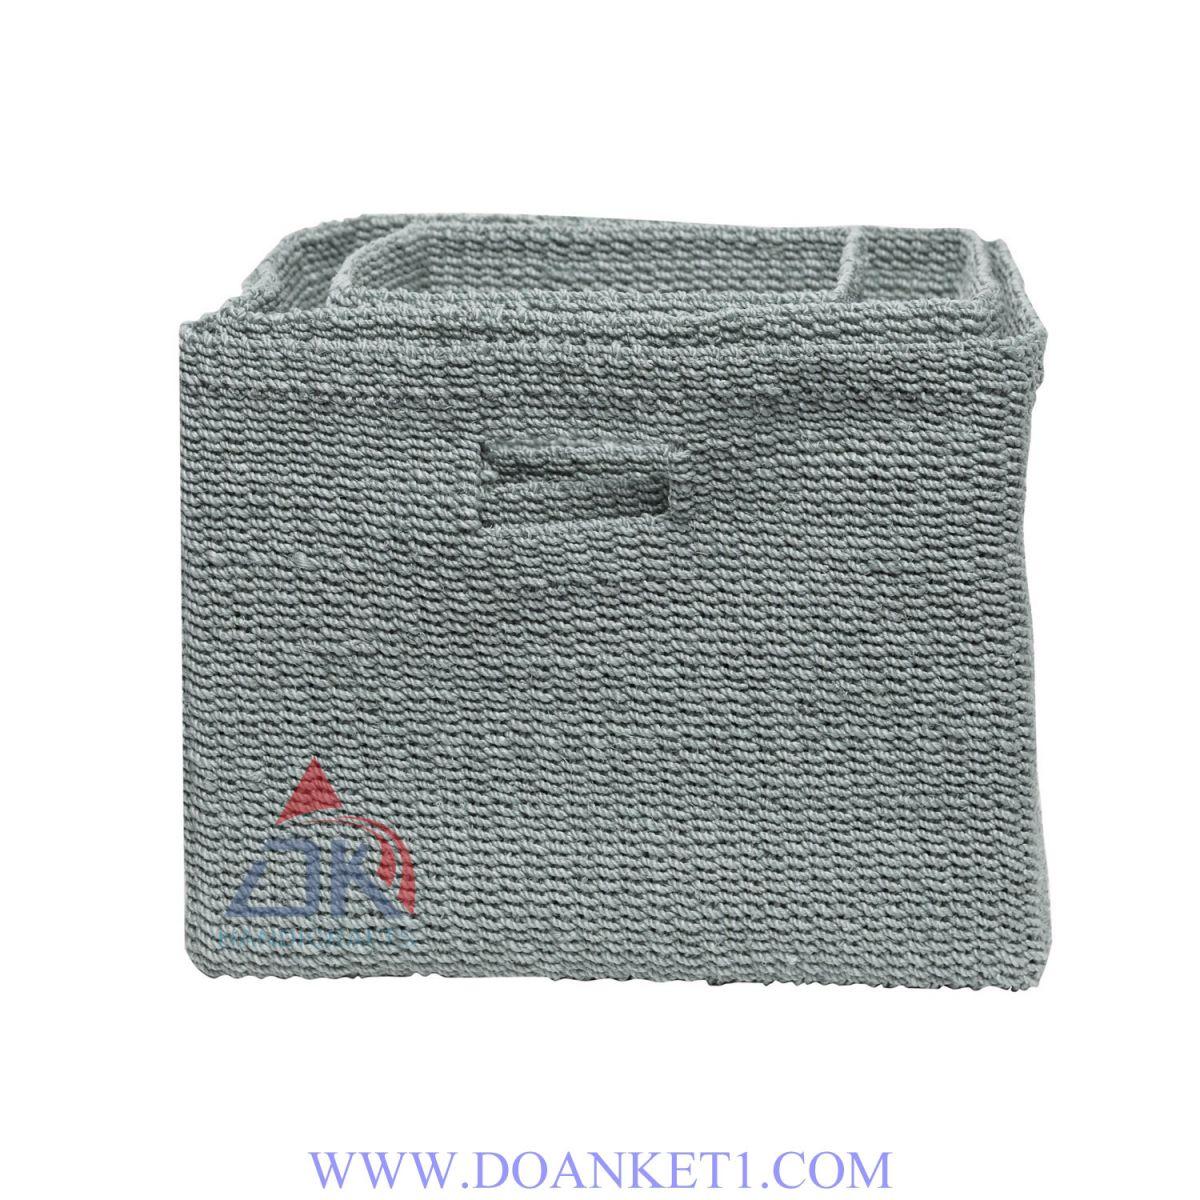 Textile Basket # DK137